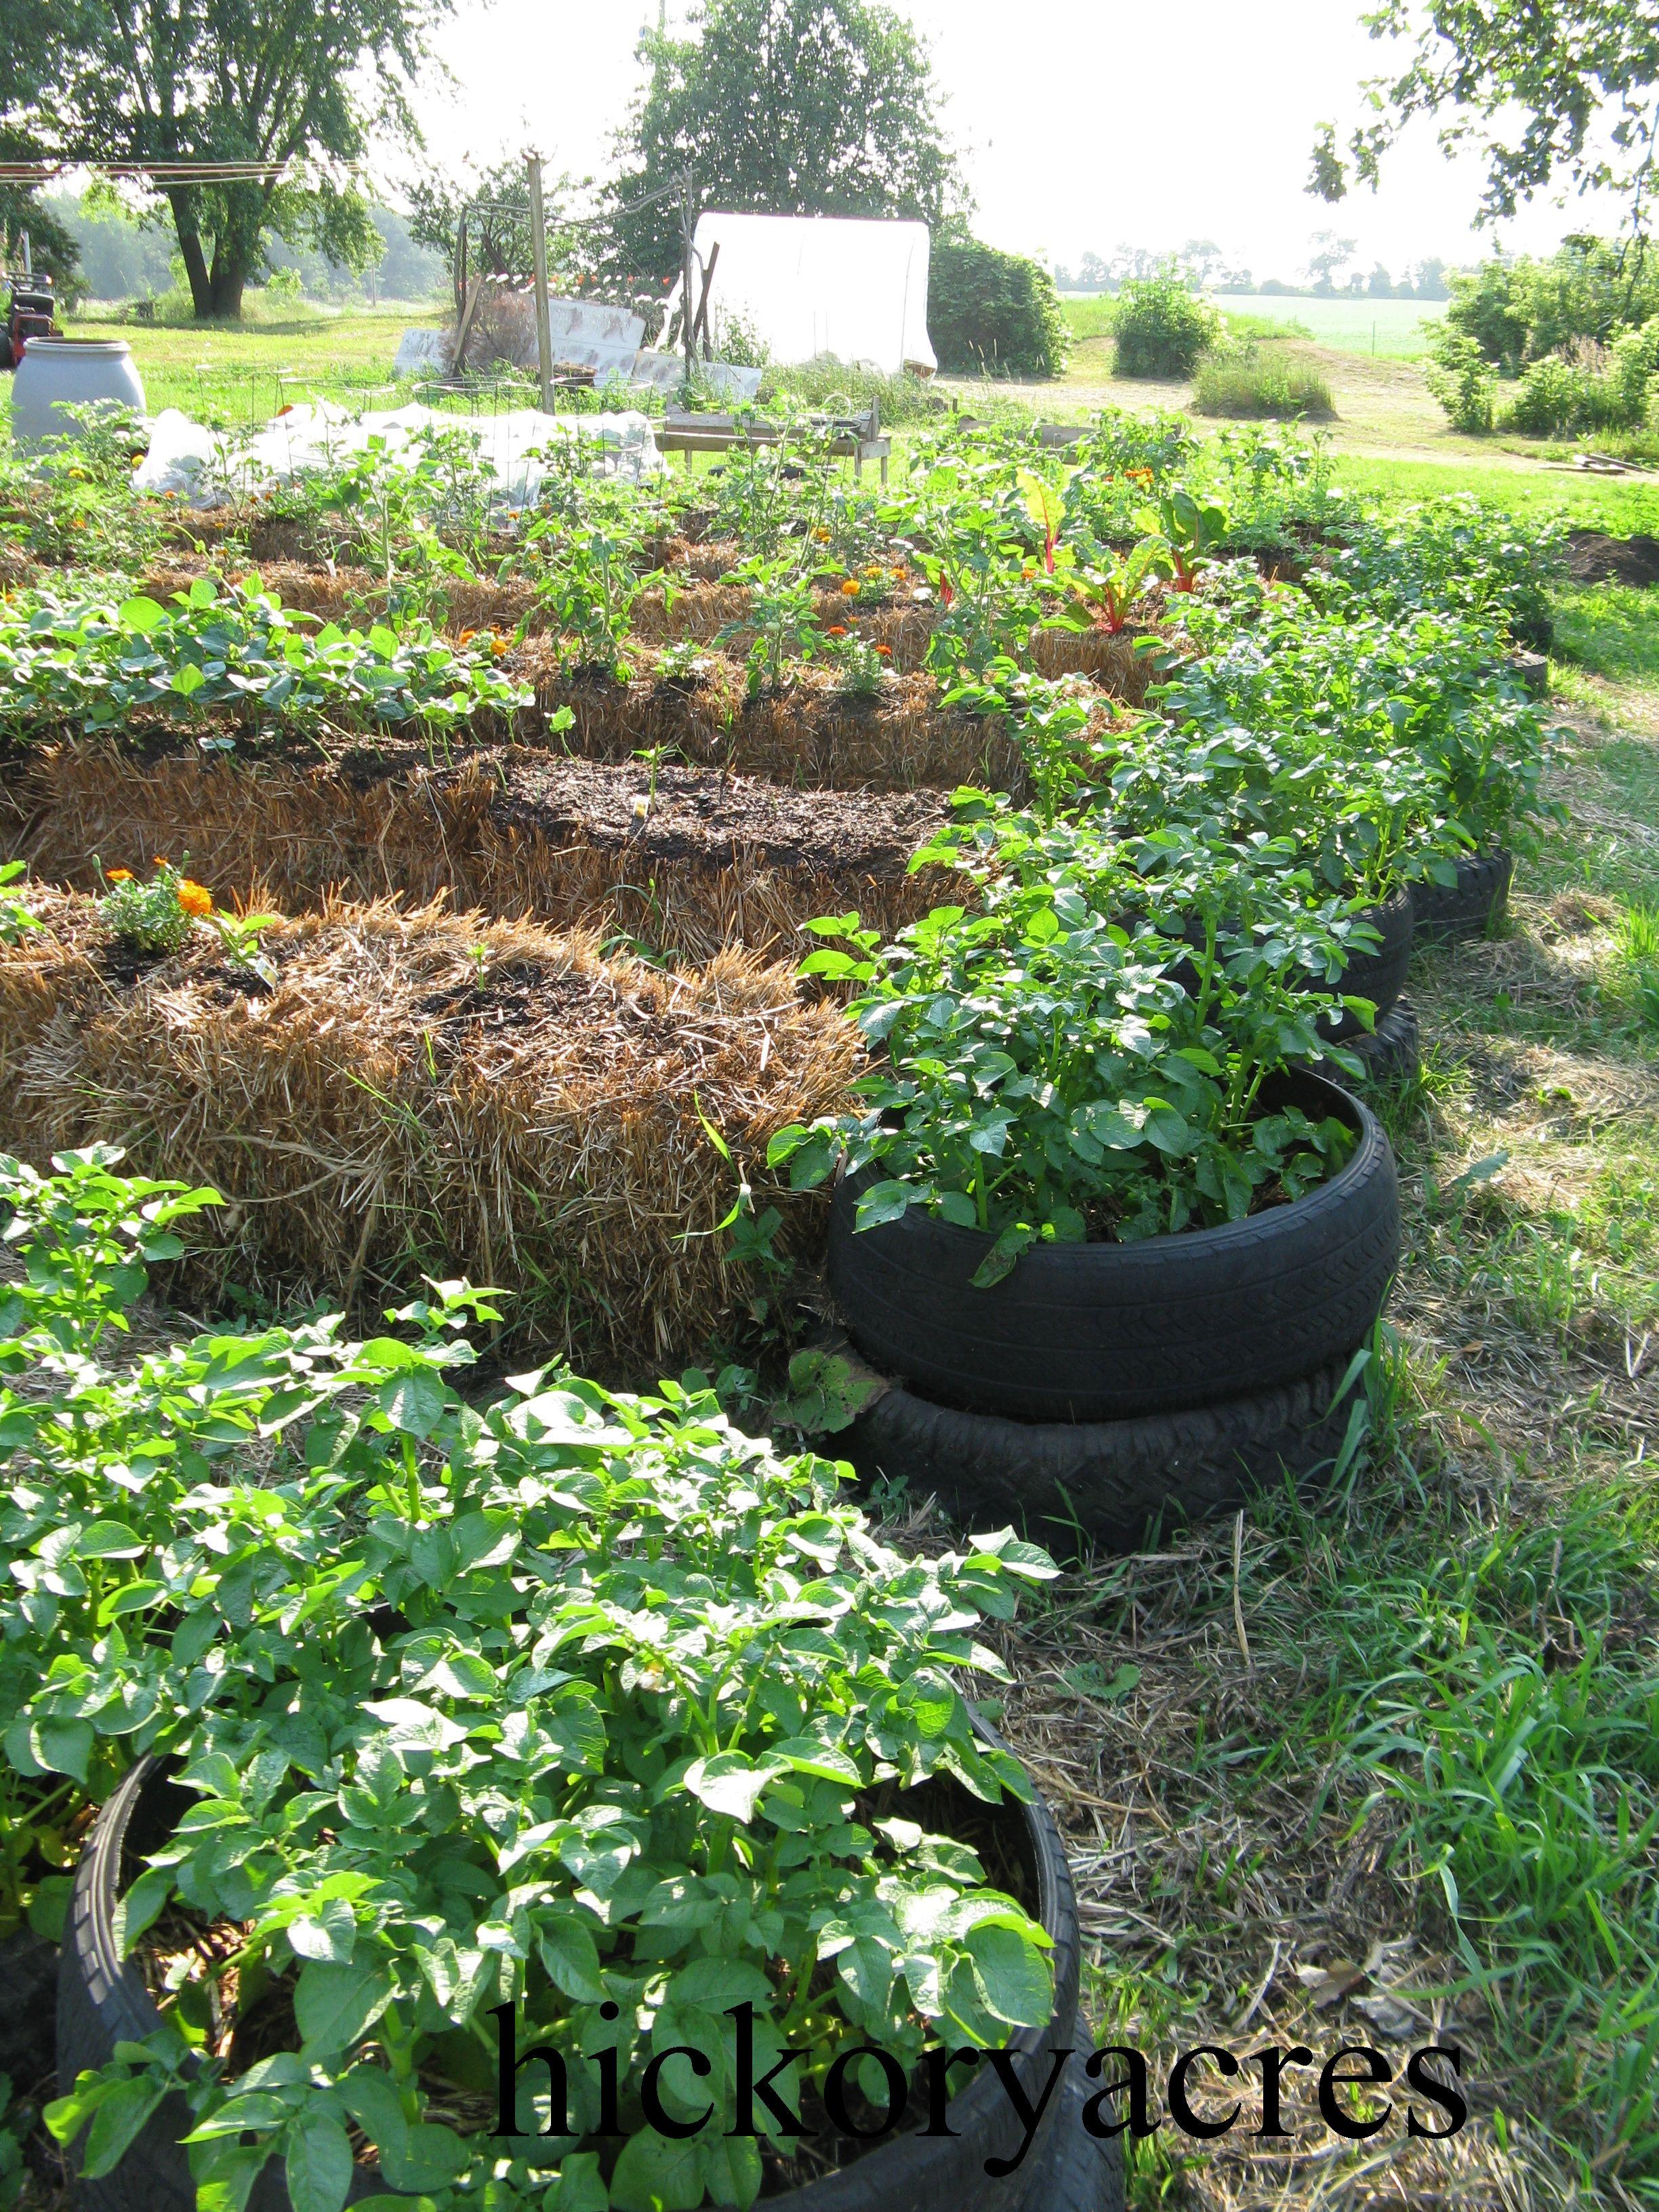 Pin By Delanie Tiakia On Hay Bale Gardening Growing Vegetables Straw Bale Gardening Growing Food